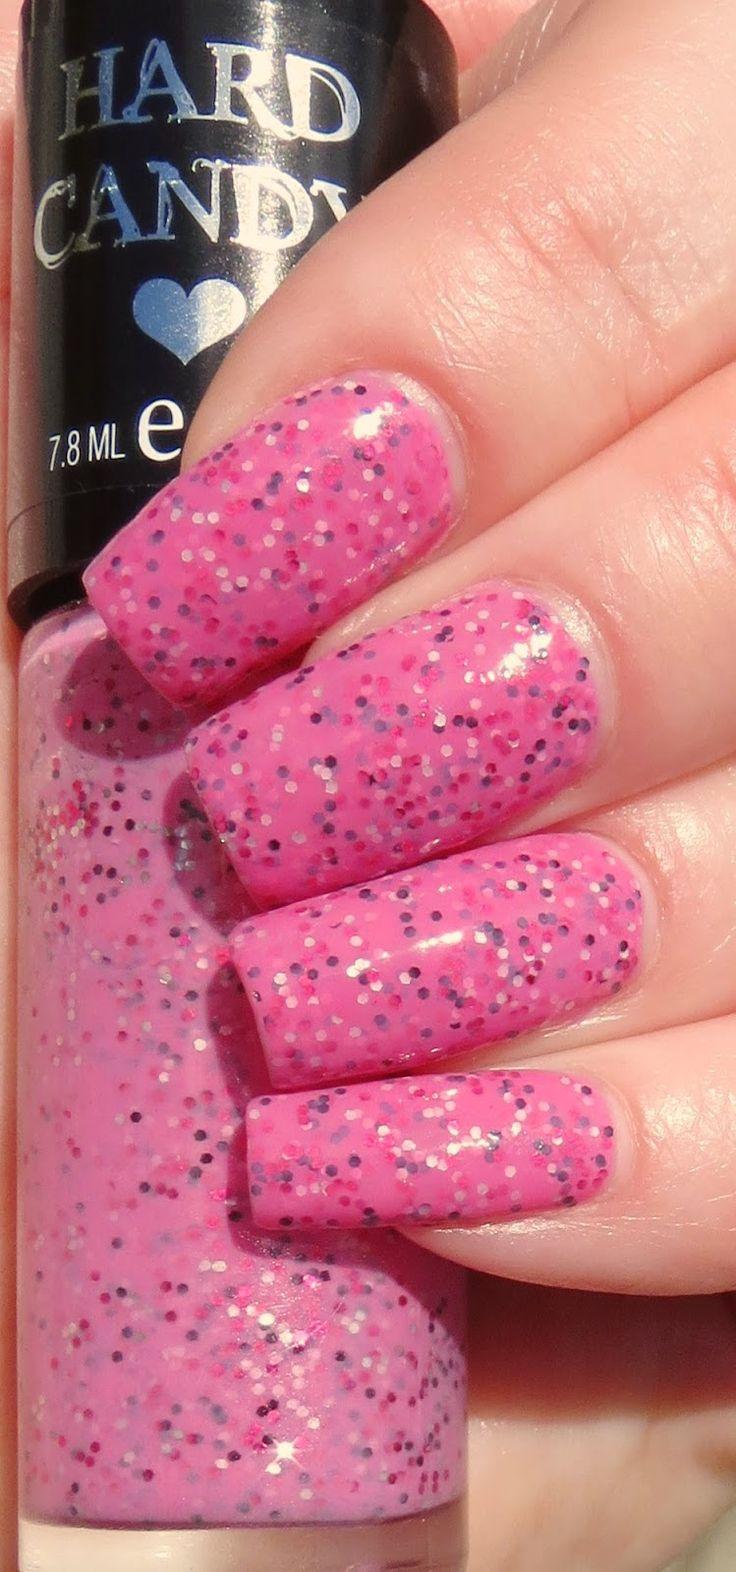 Hard Candy Nail Polish - Pink Taffy